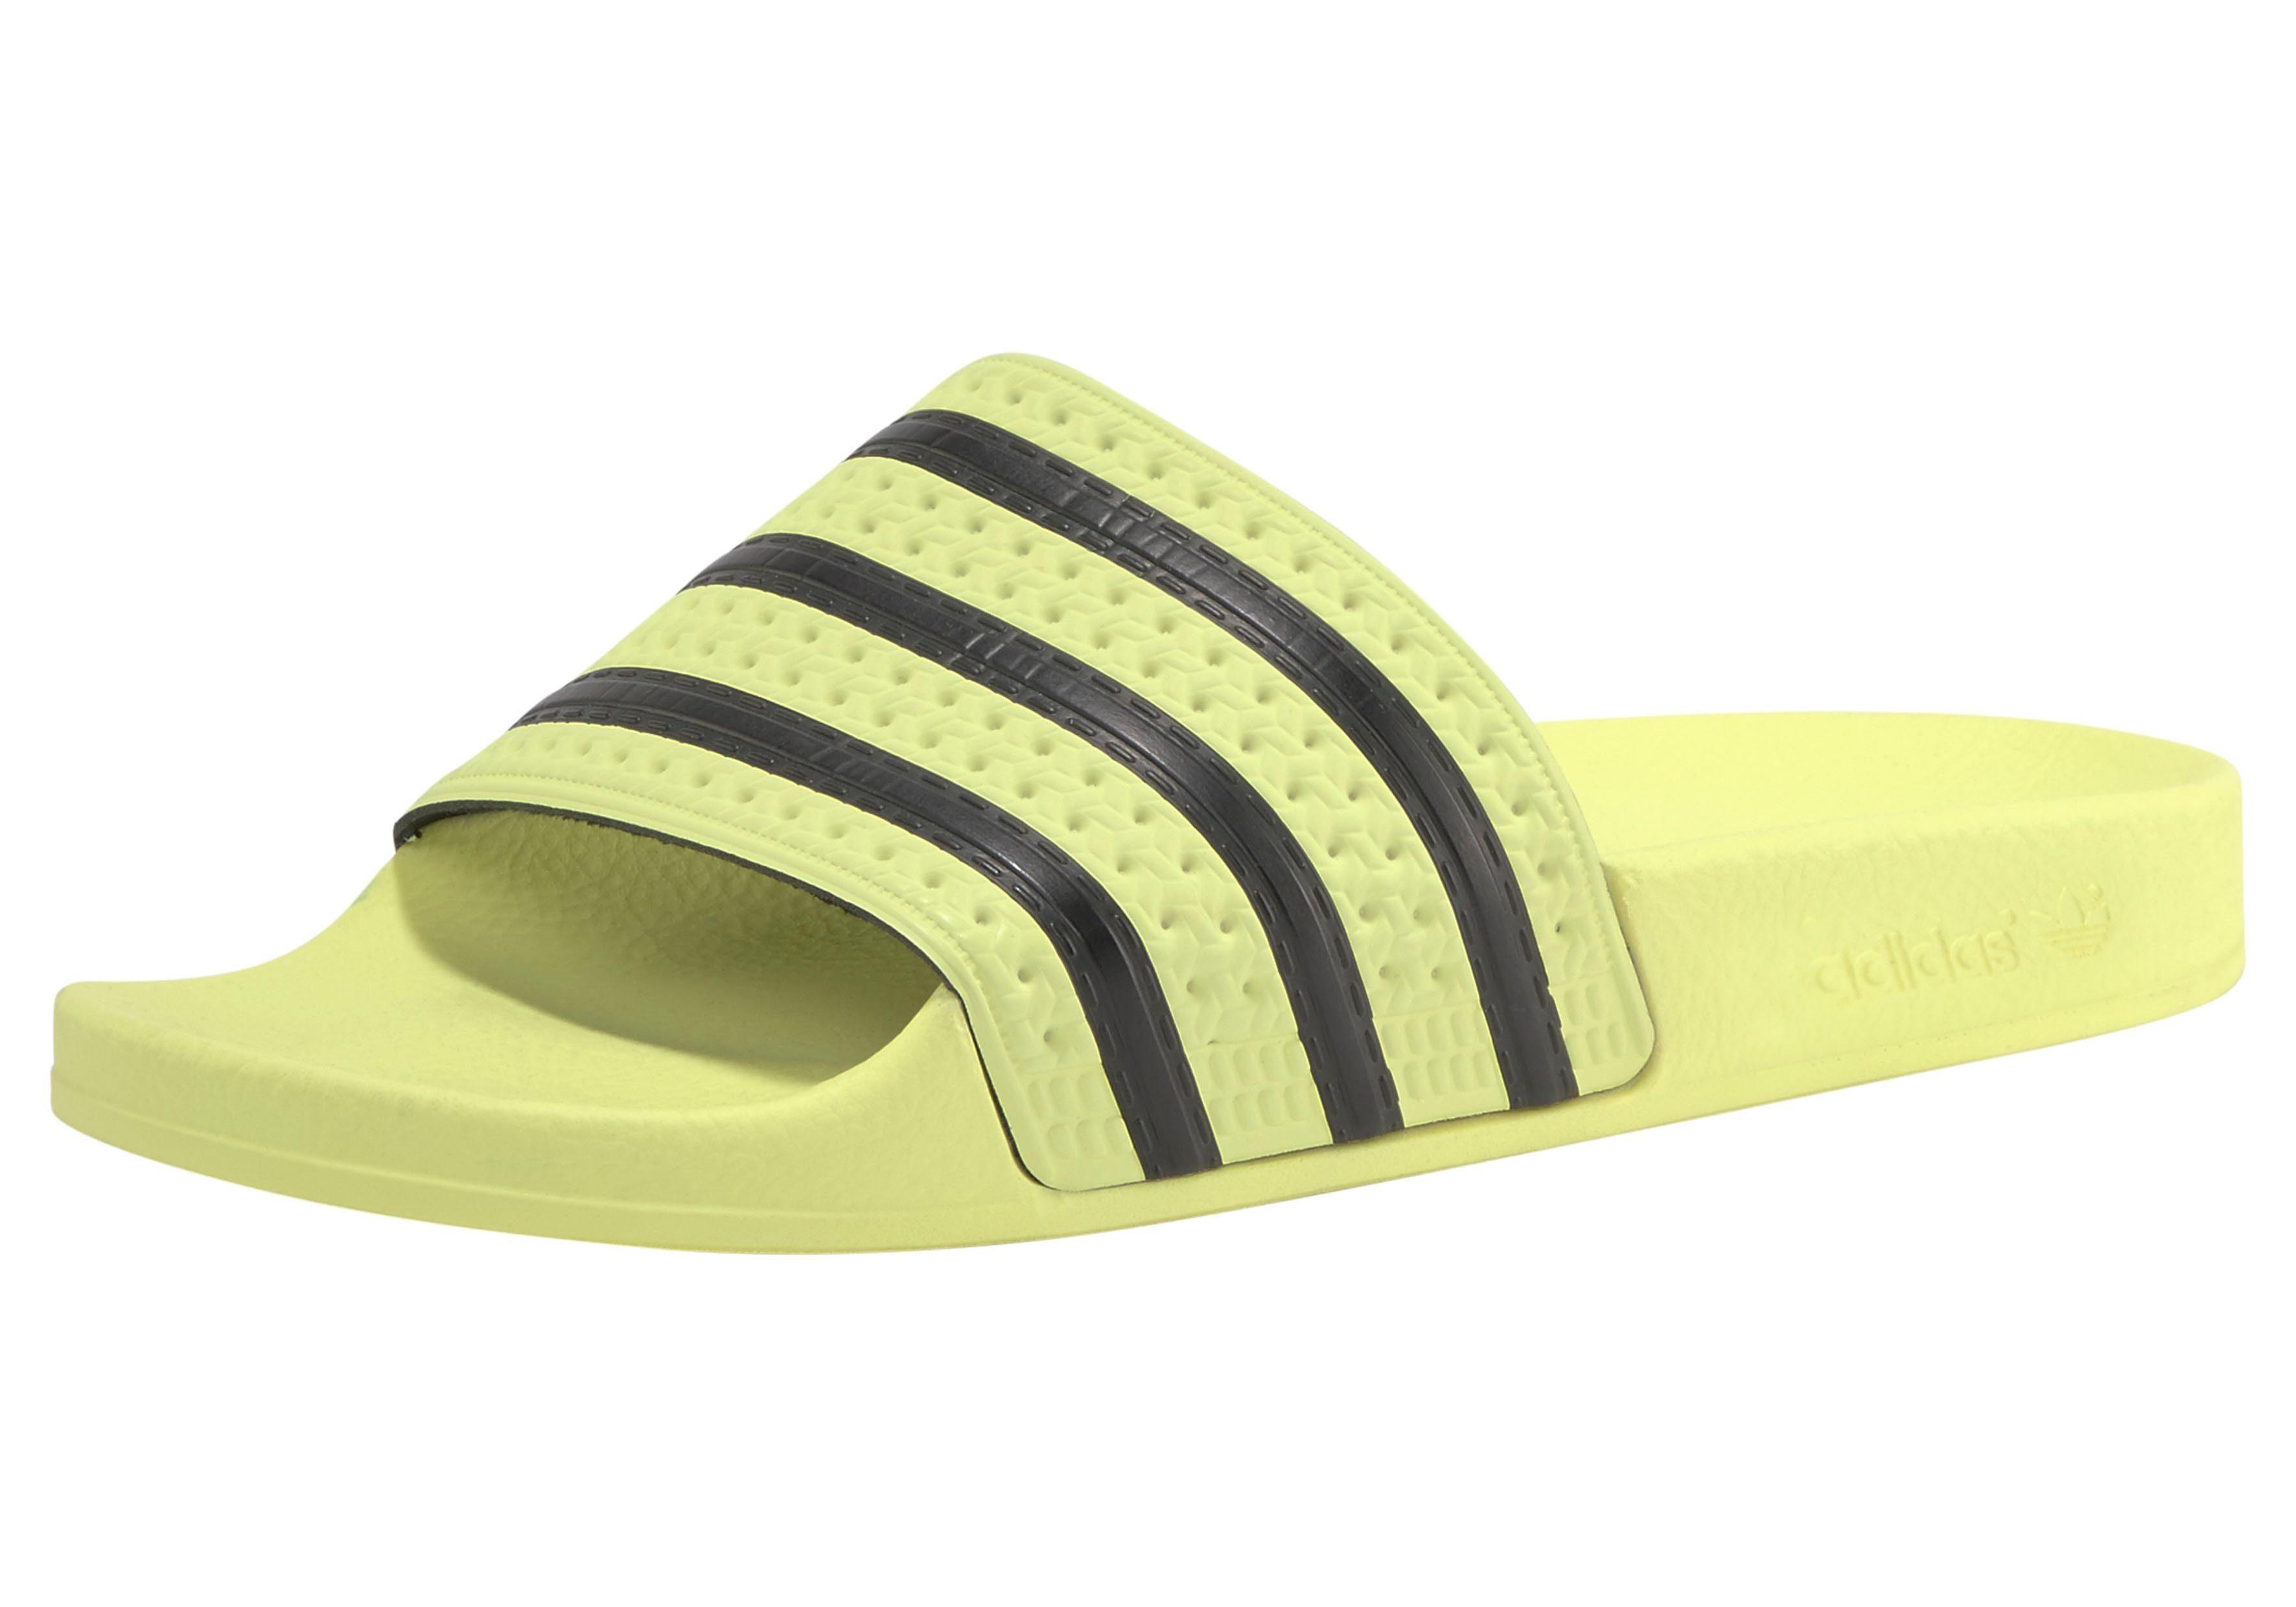 adidas Originals »ADILETTE W« Badesandale kaufen | OTTO